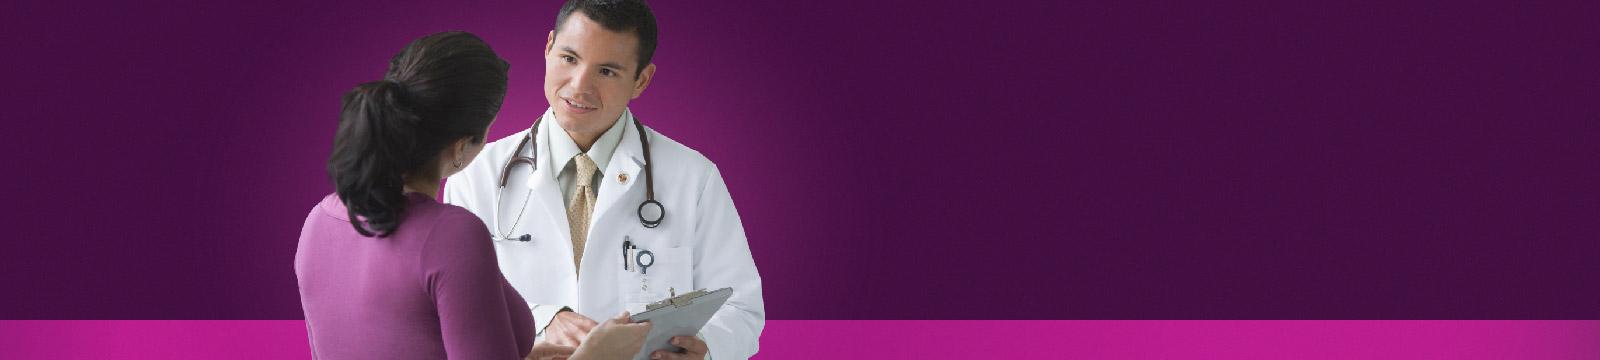 5980-Disney-Cast-Member-Enrollment---Disney-Landing-Page-Updates-Final_1600x360-Physicians